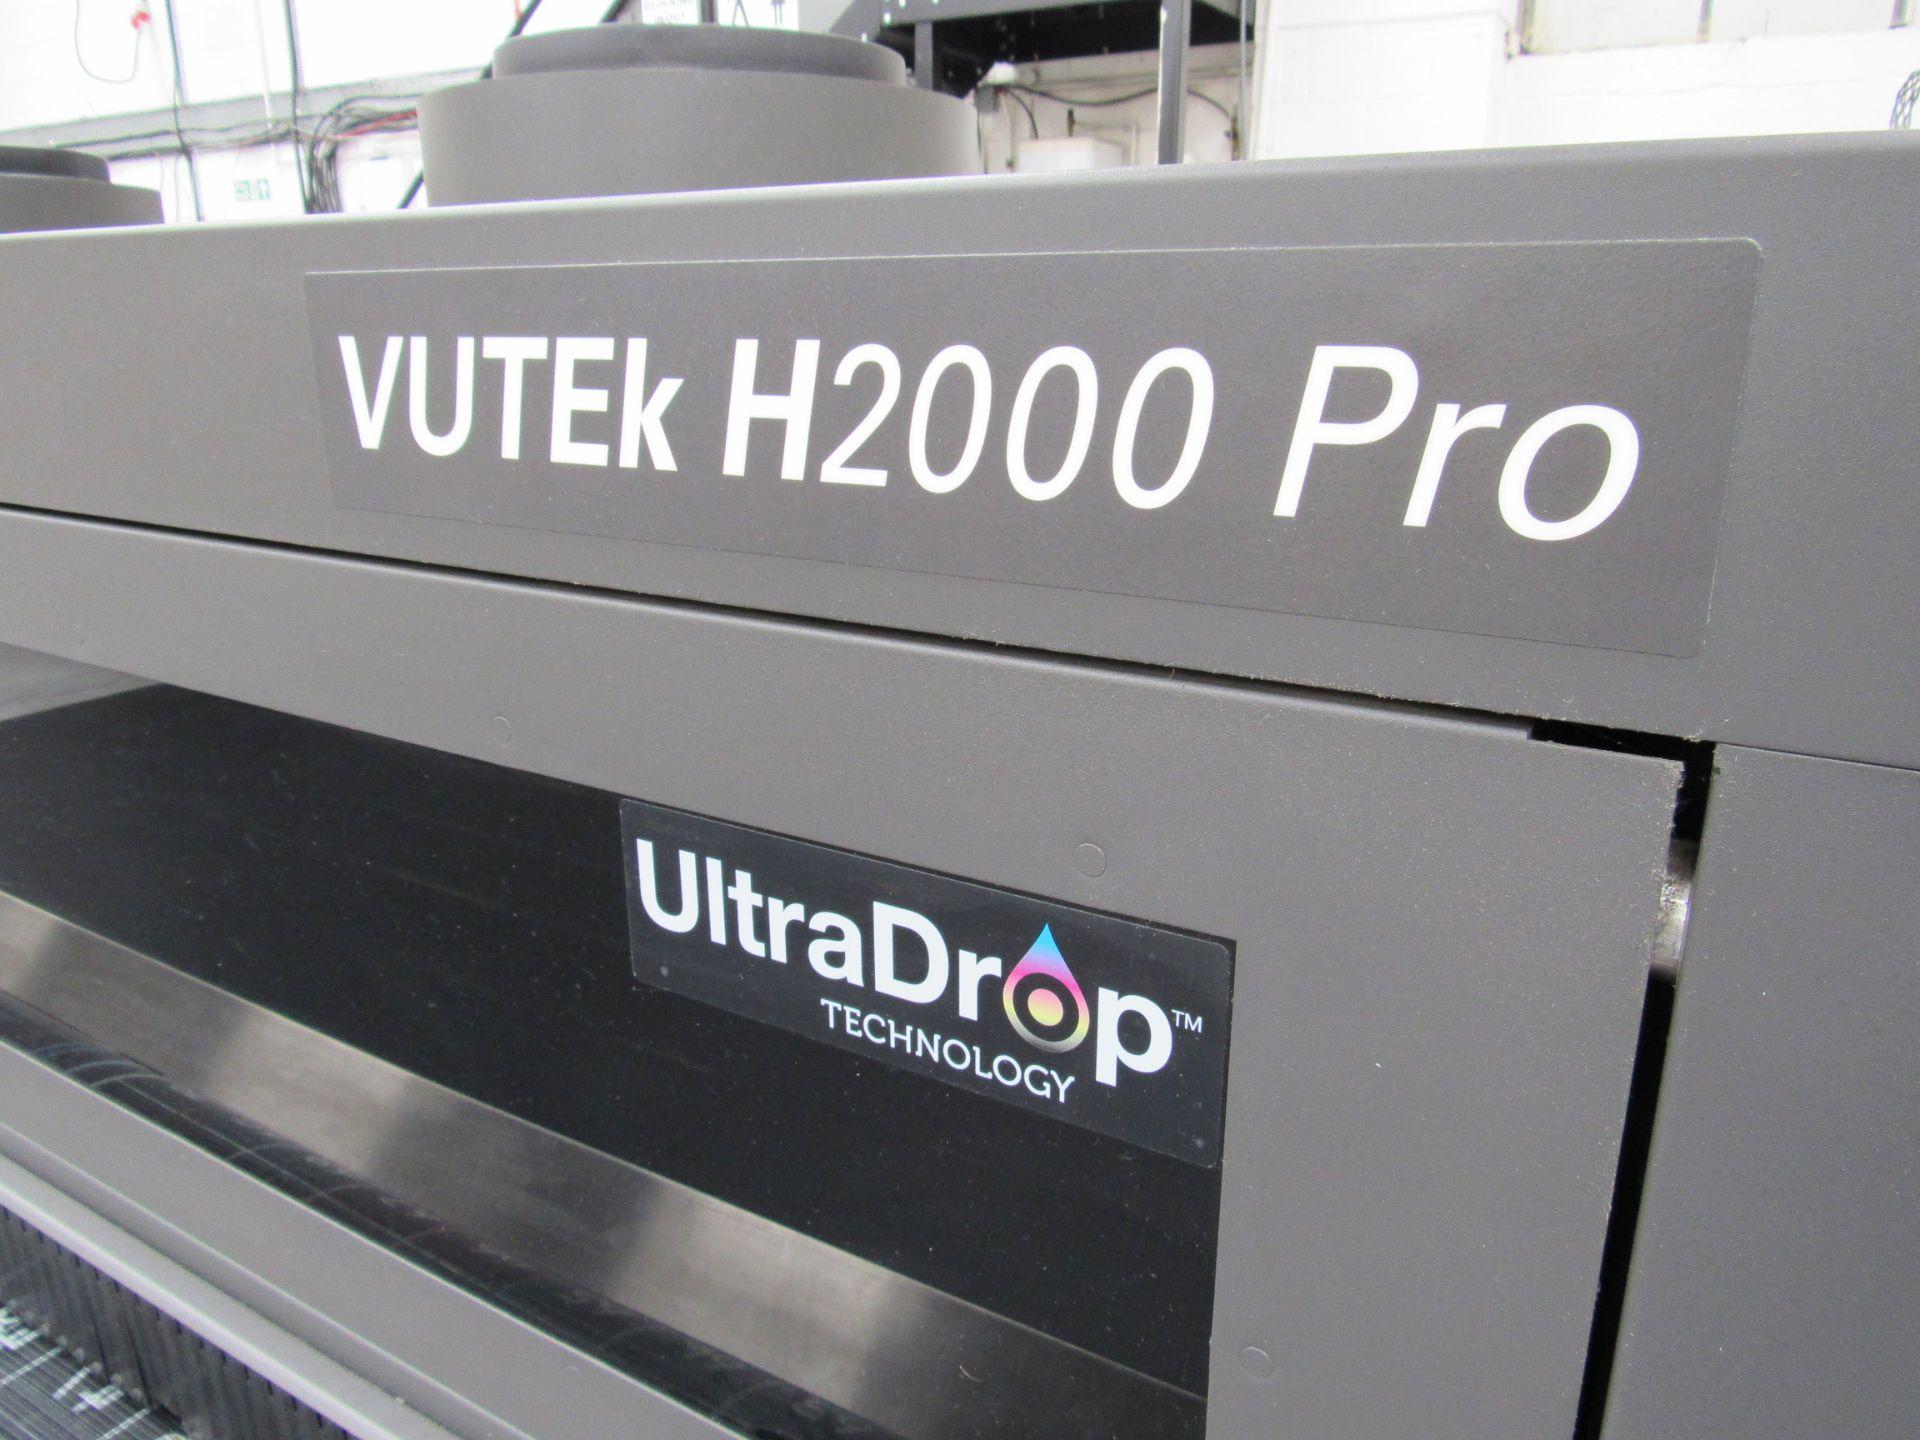 EFI VUTEk H2000 Pro - UltraDrop Technology UV 2m Hybrid Printer, Serial Number 262013, Dec 2014, - Image 7 of 16